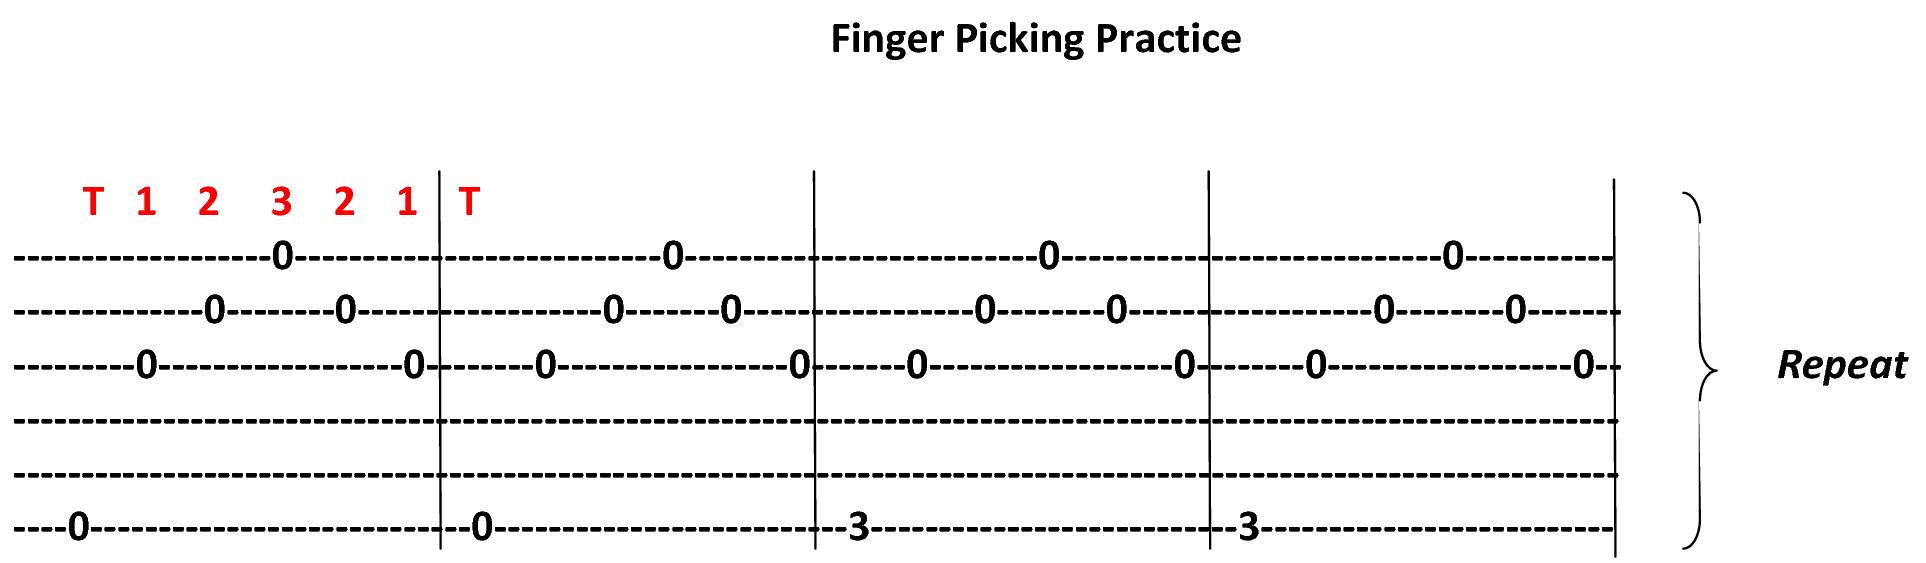 crop finger picking practice 2